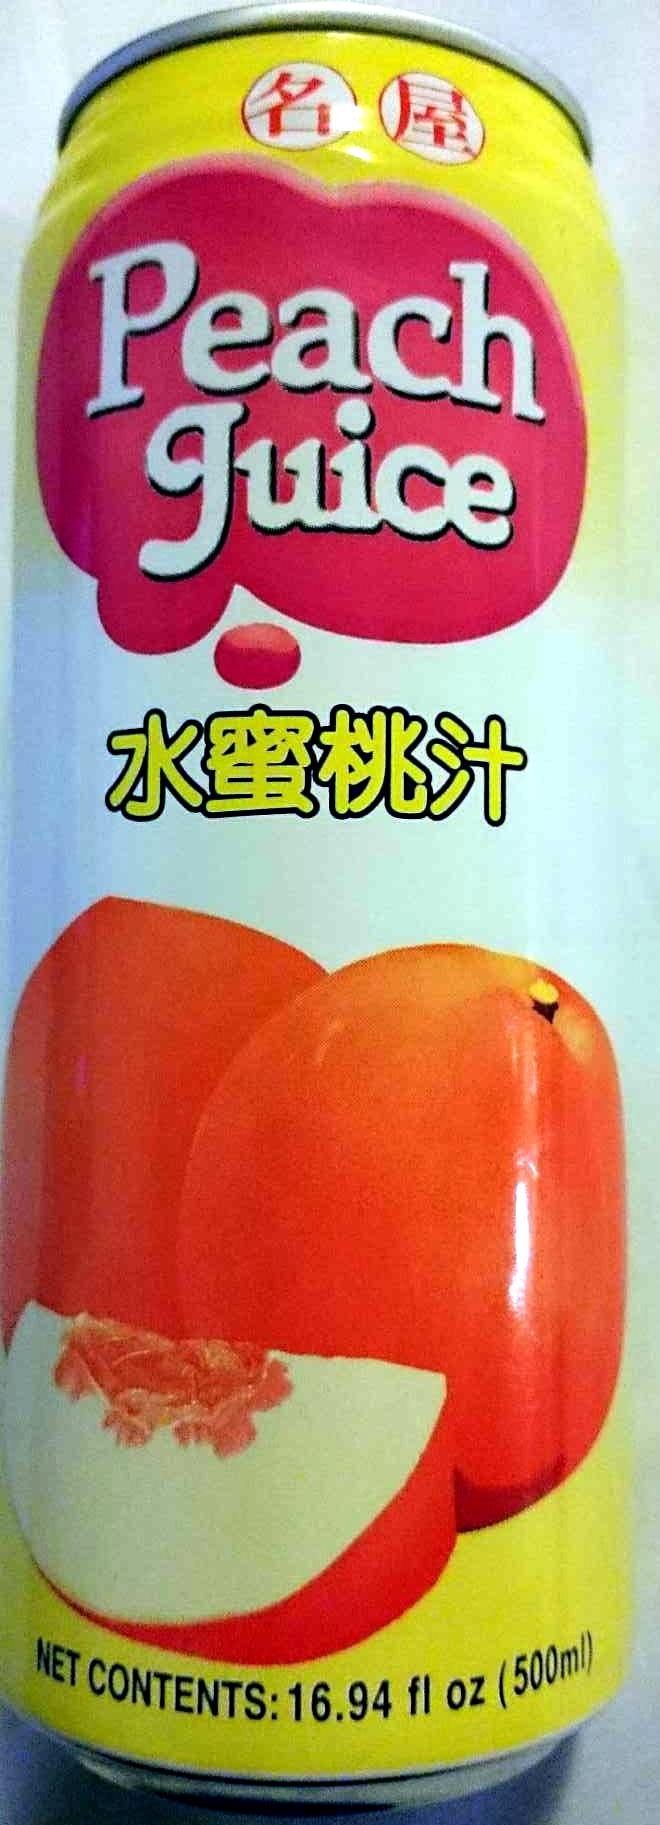 Peach Juice - Product - en